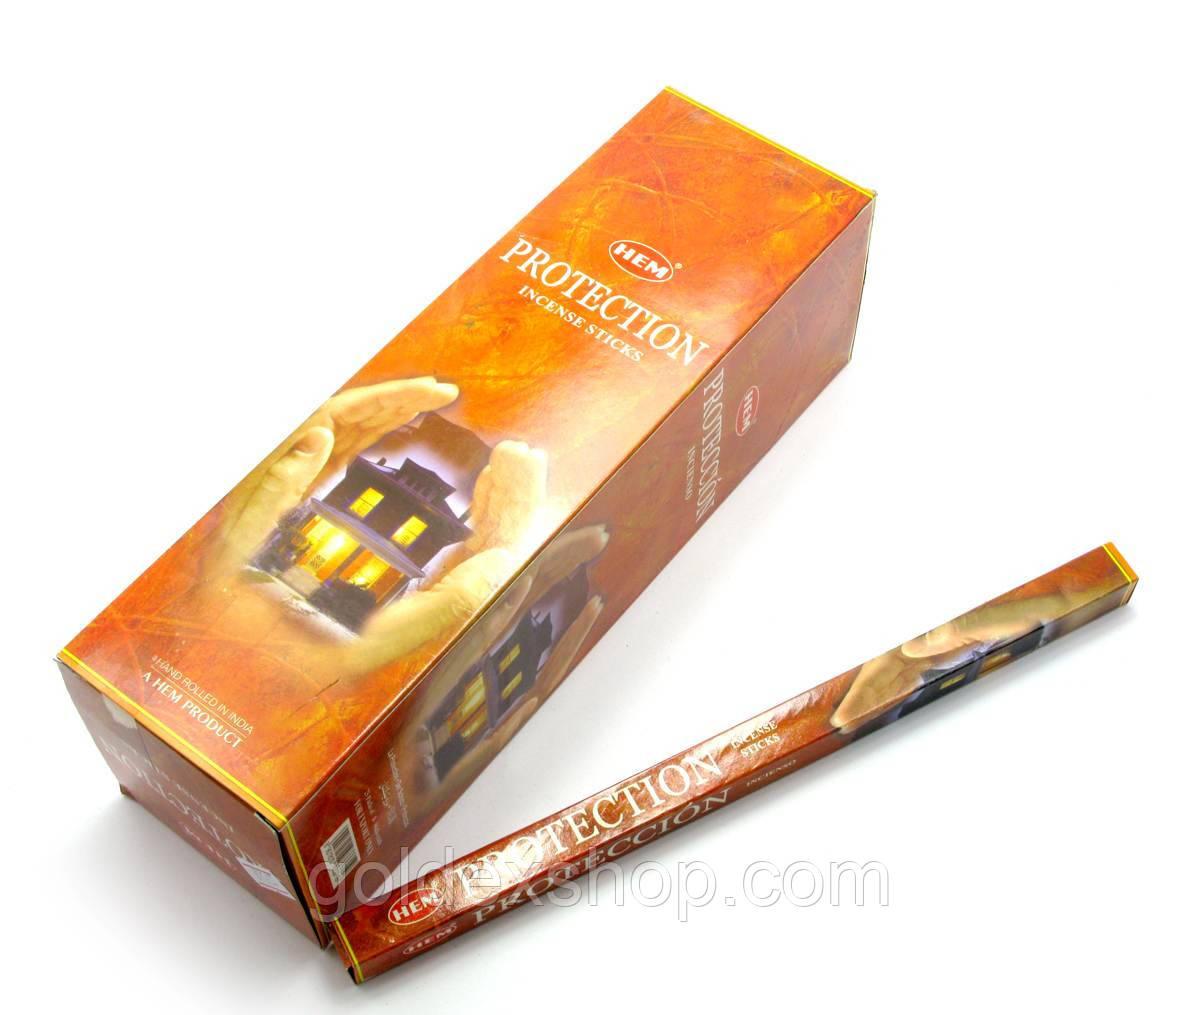 Protection (Защита) (Hem) квадрат, аромапалочки